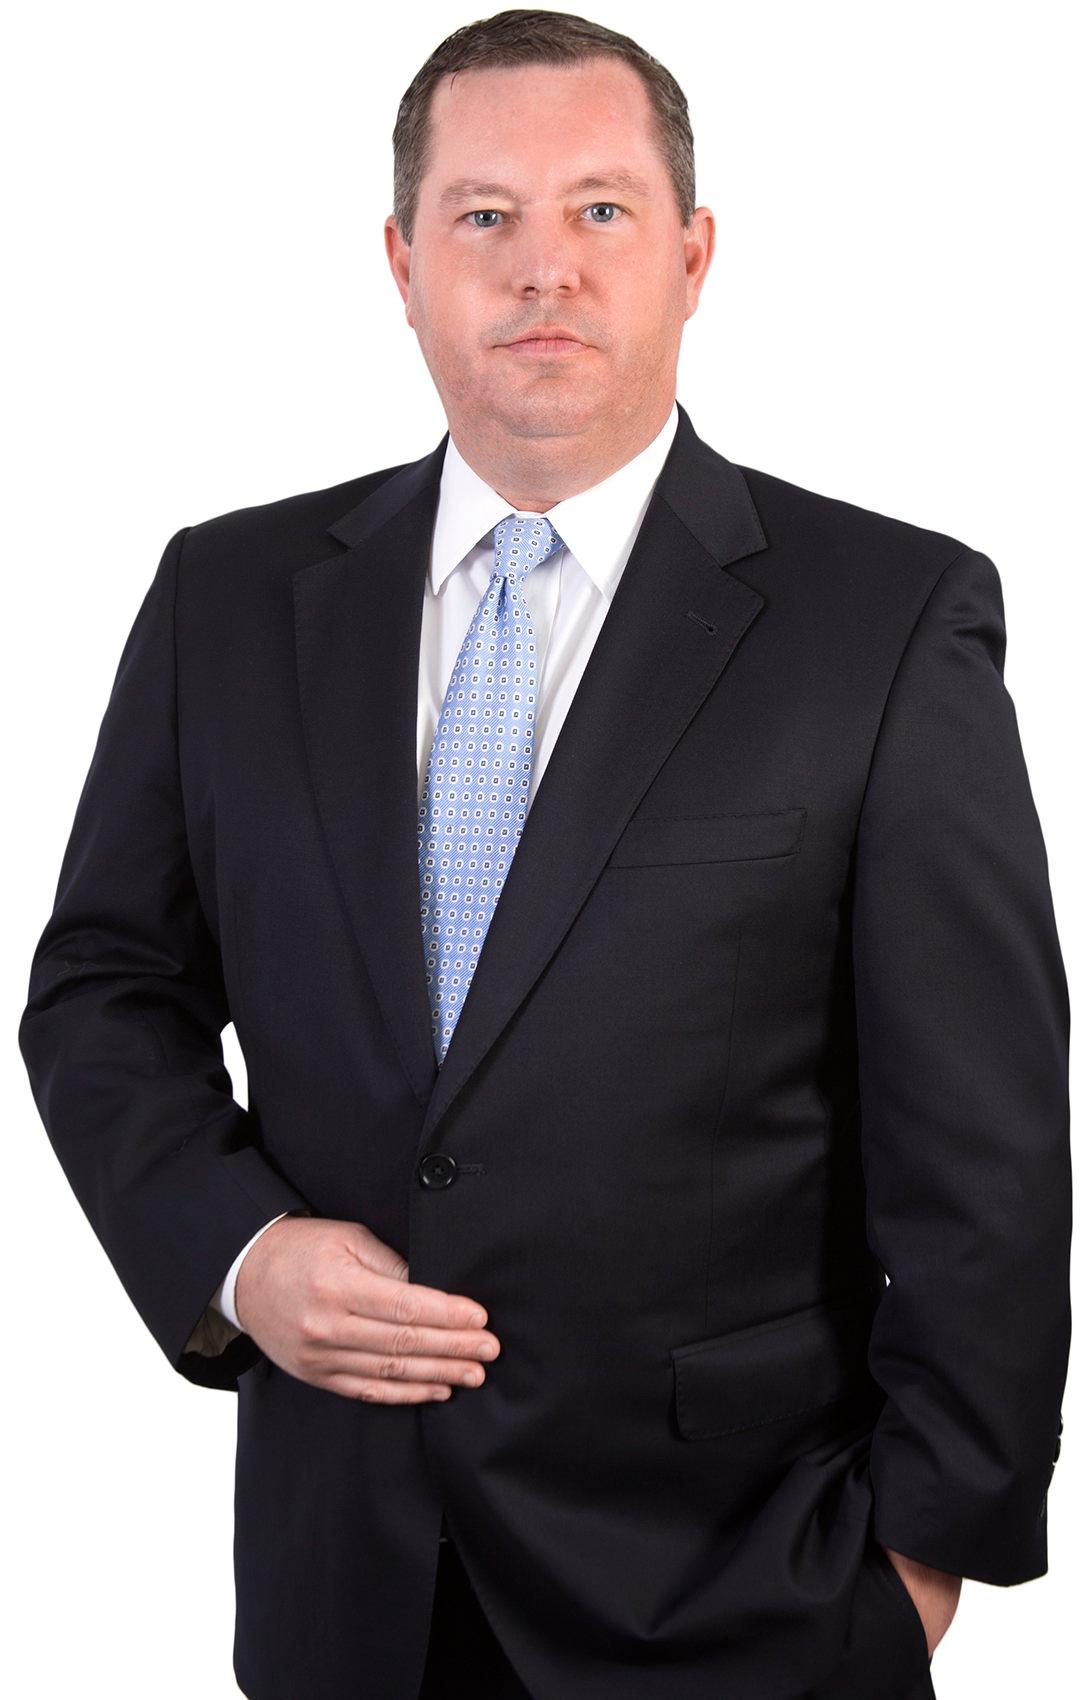 Daniel F. Blanks